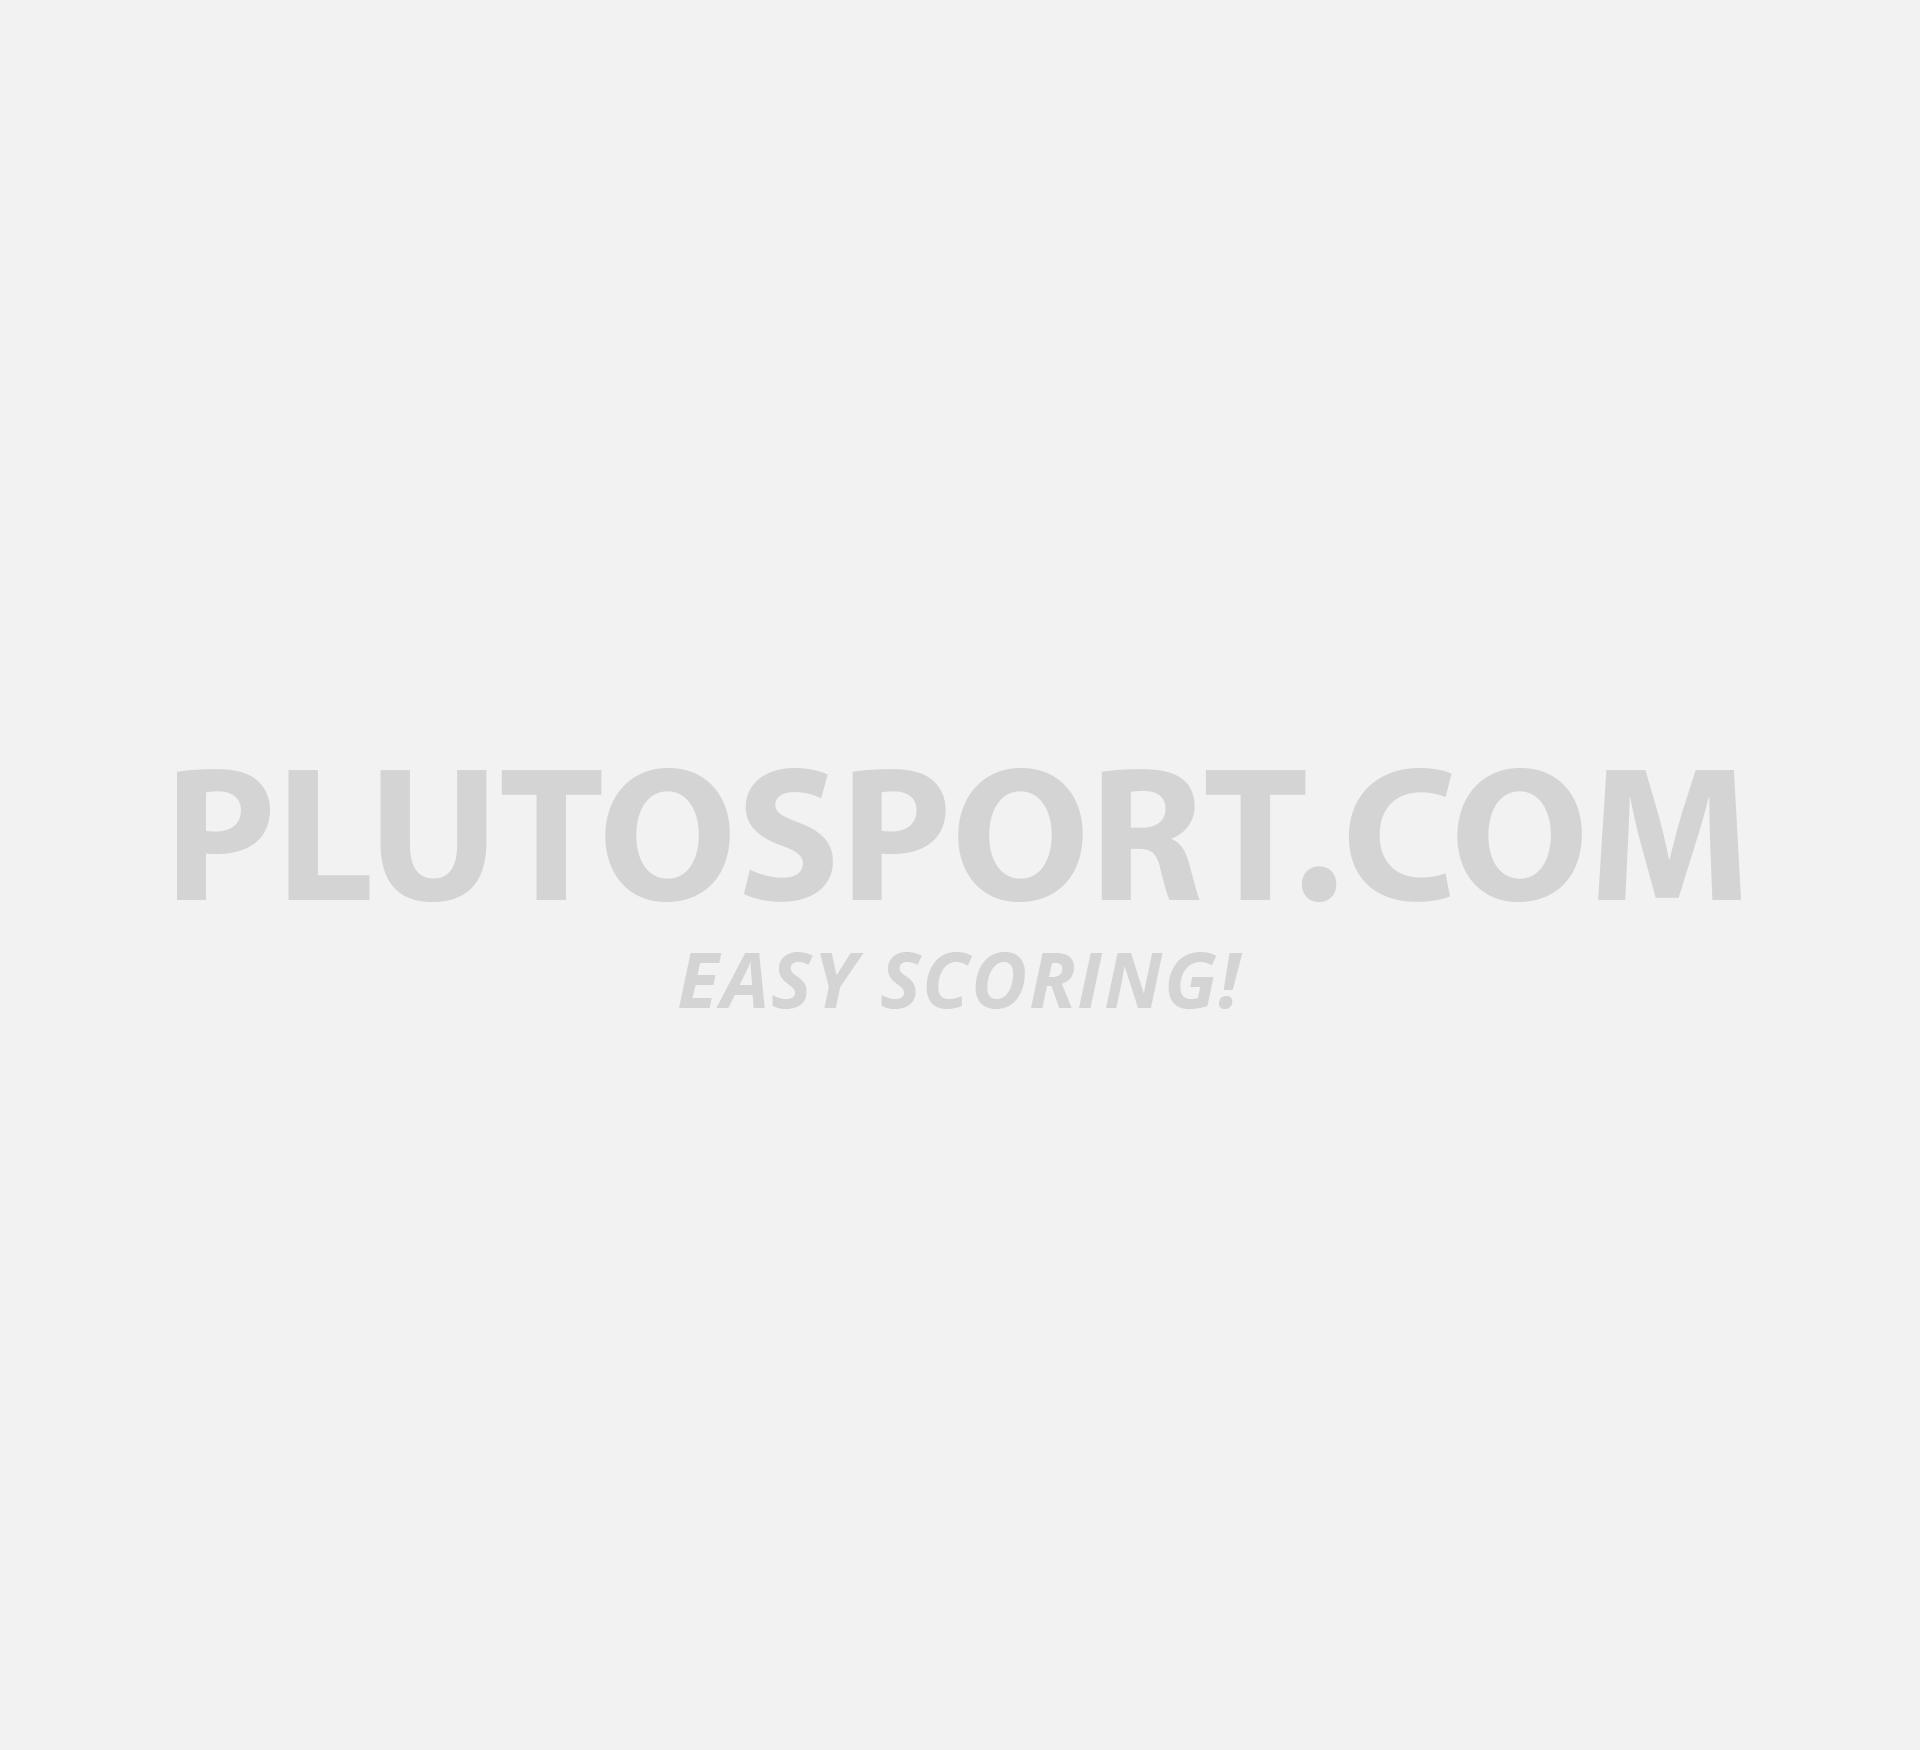 best service 11293 a9358 france adidas zx 900 oransje grå 1d1bb 30cd7